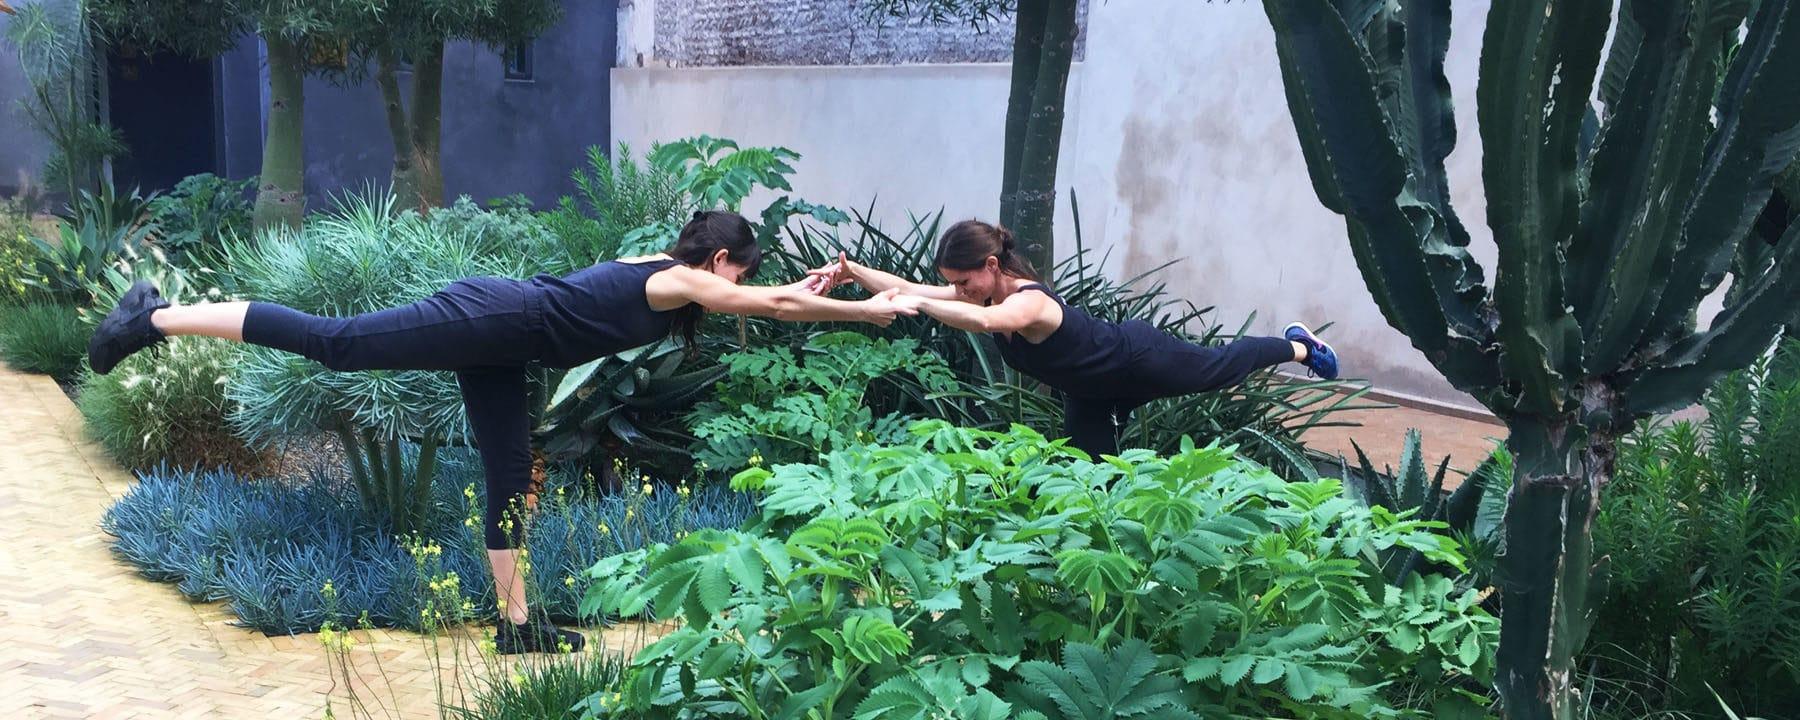 nosade-yoga-venues_source-nosade